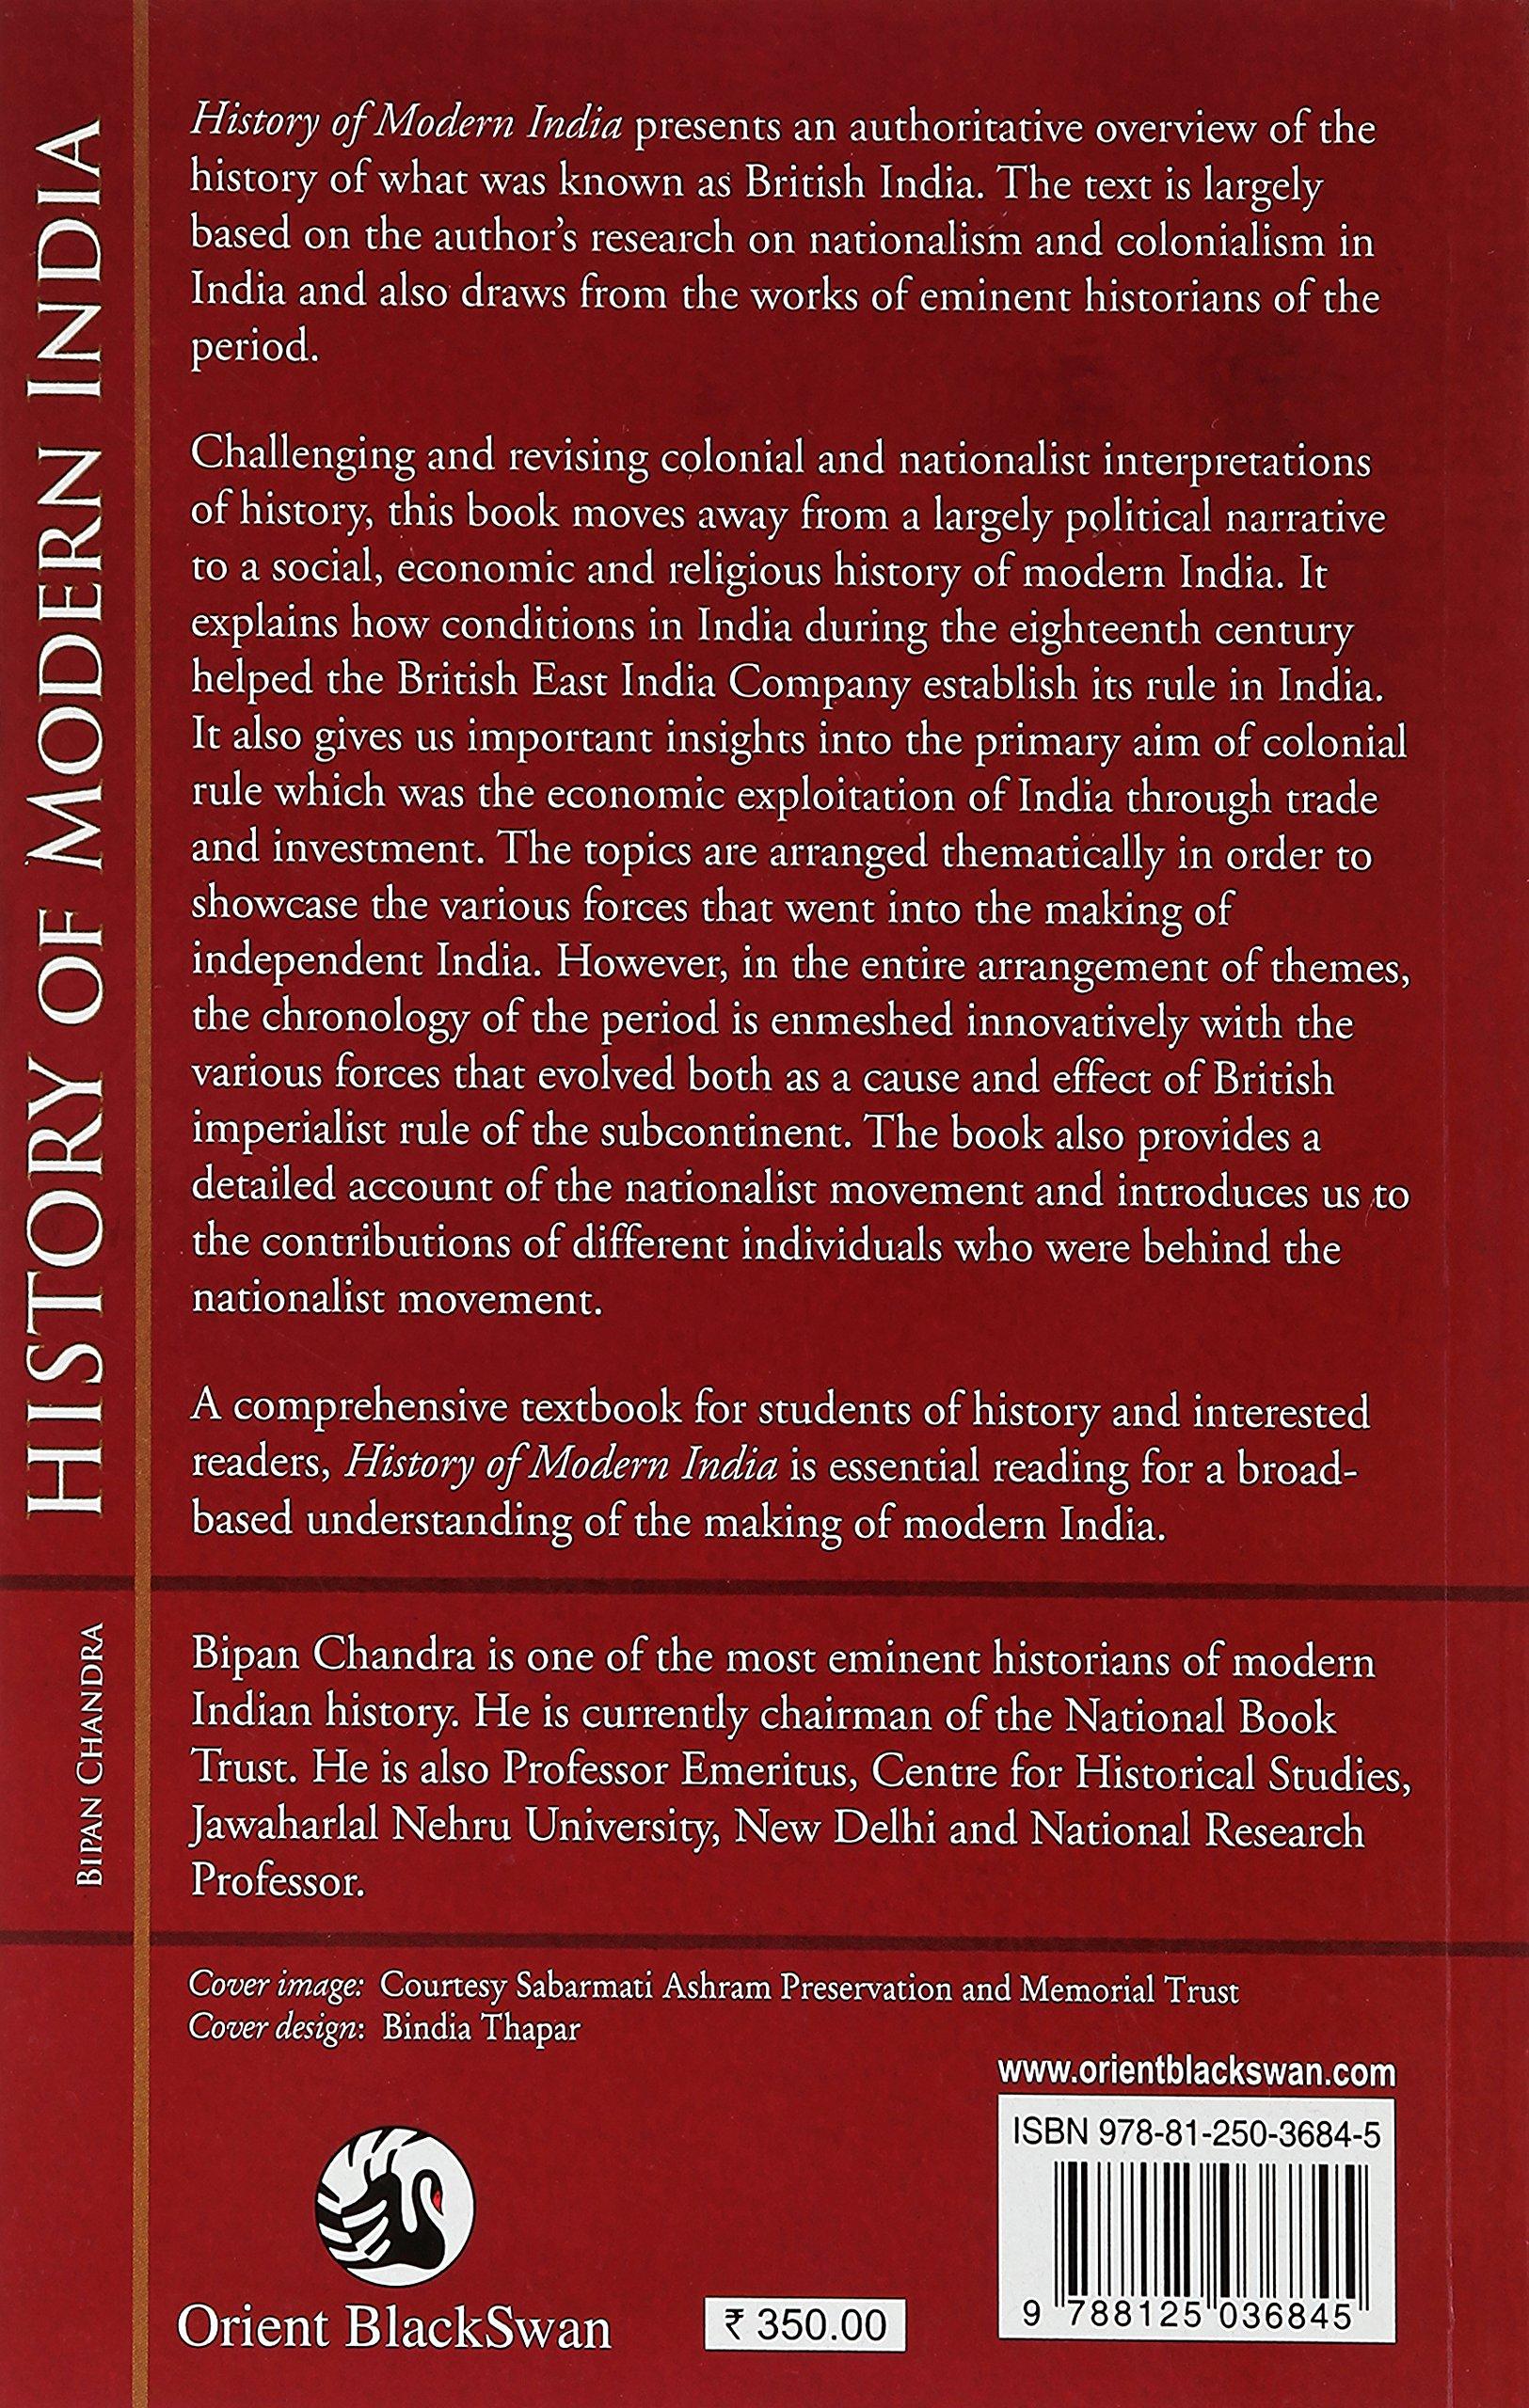 HISTORY OF MODERN INDIA BY BIPAN CHANDRA EBOOK